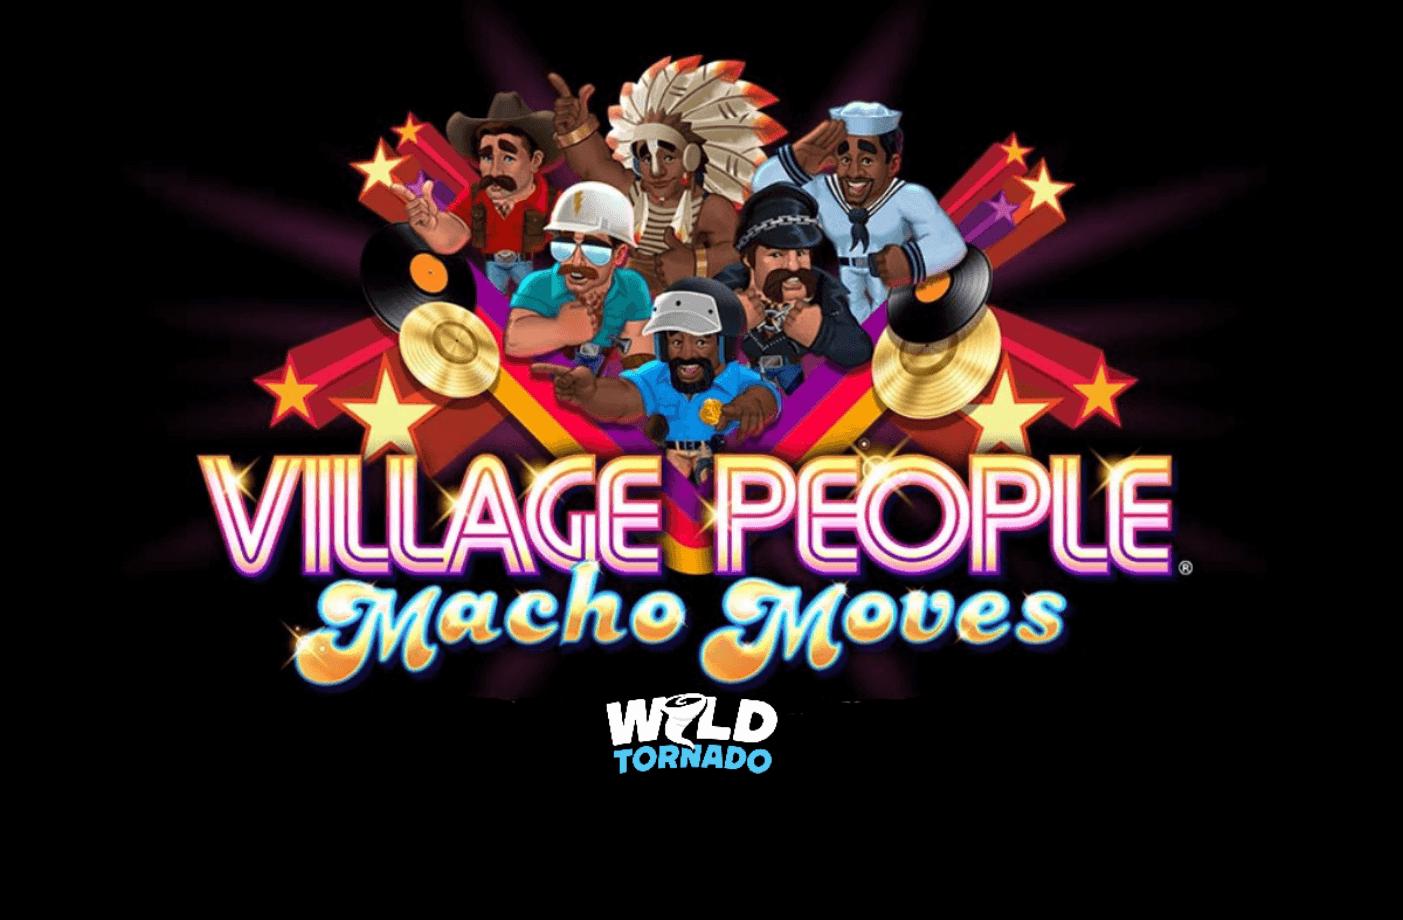 Village People Macho Moves Slot - Disco Reels Catch Fire